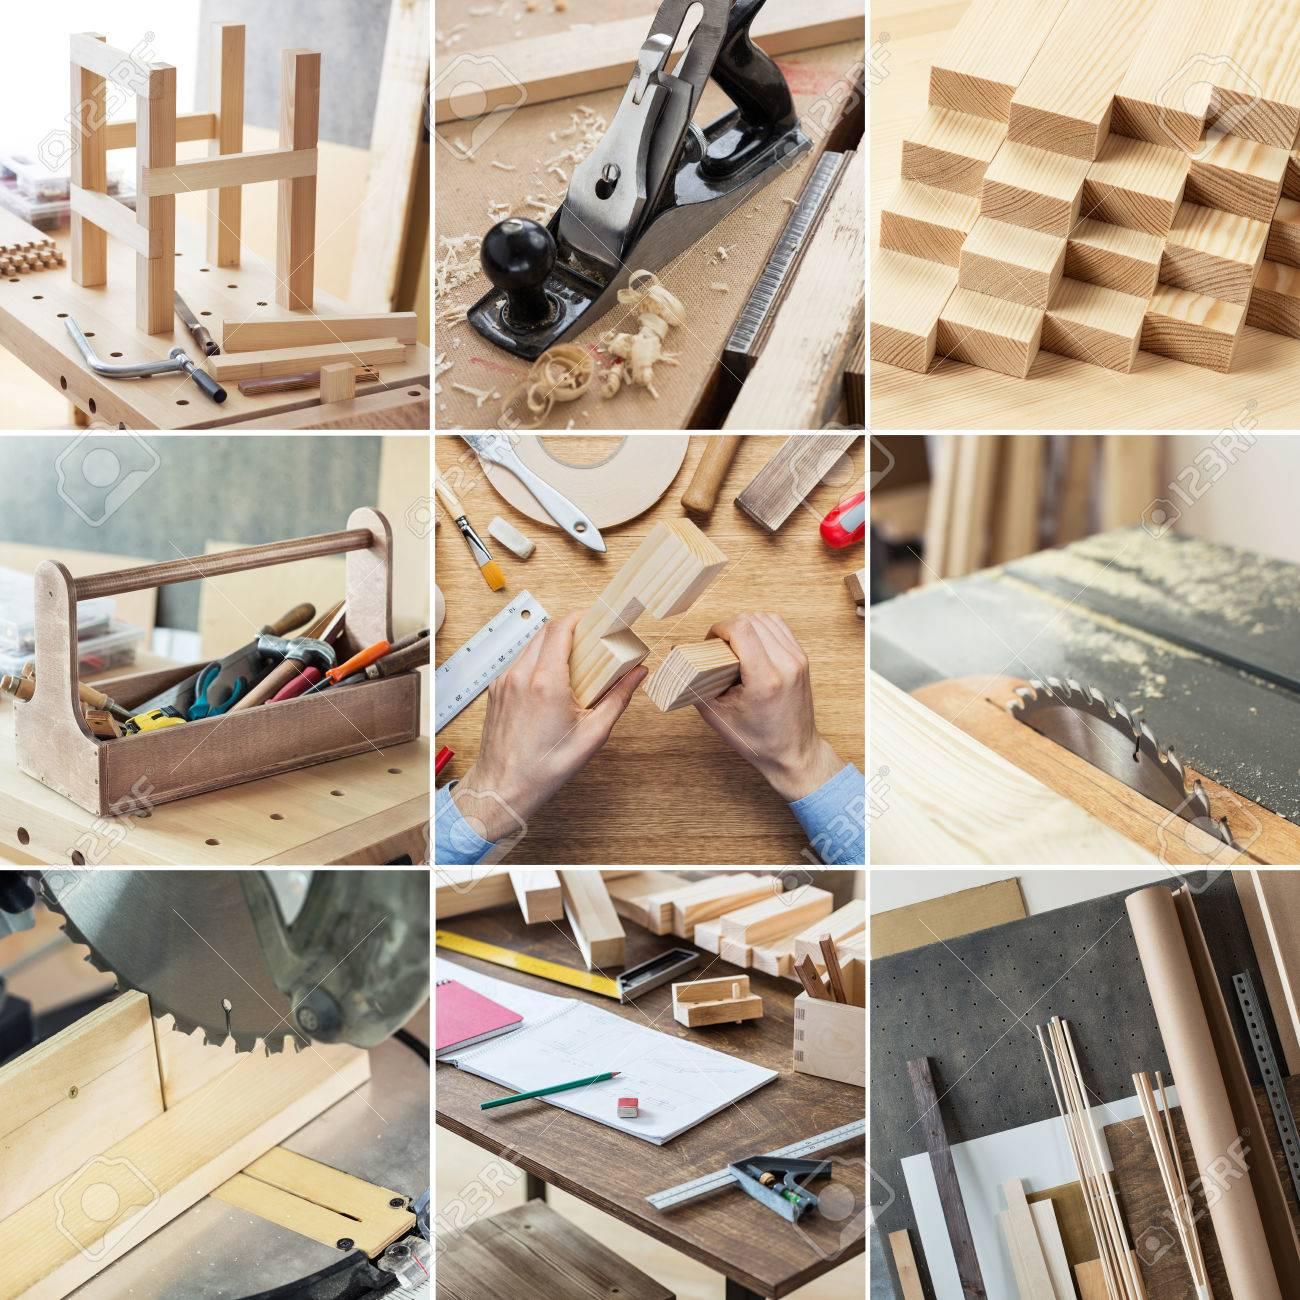 Various Woodworking Carpentry Repairing Diy Tools And Supplies